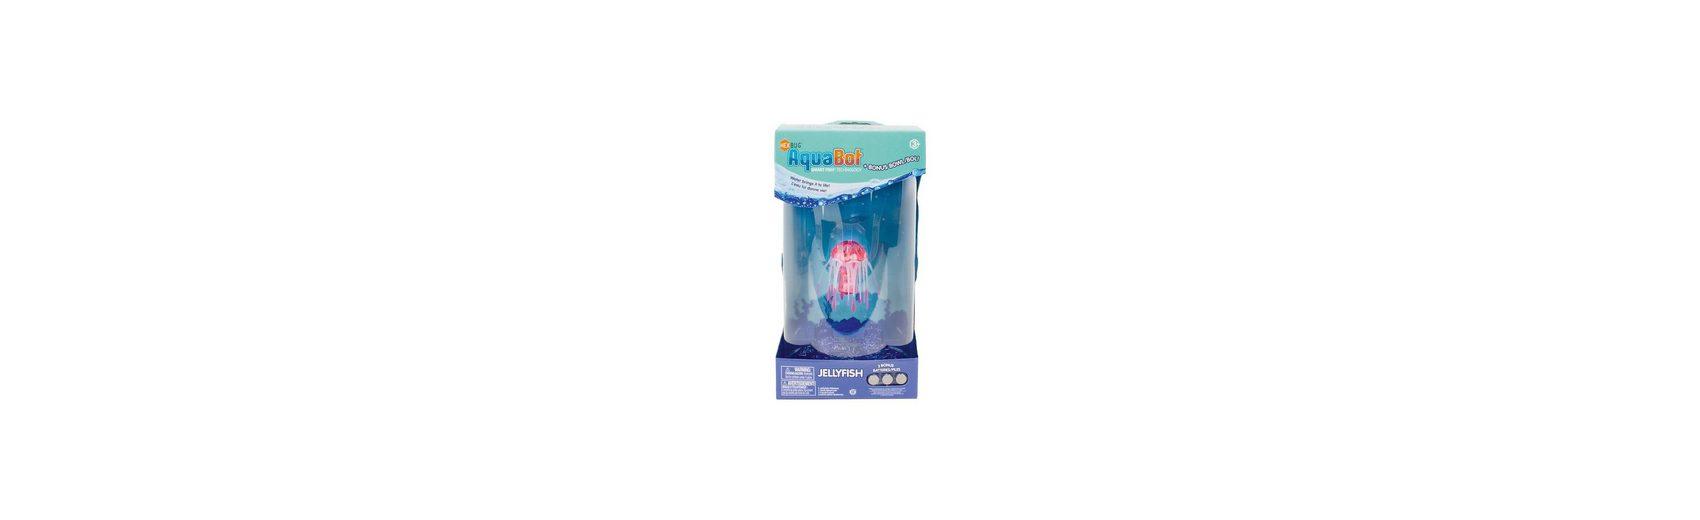 Hexbug Aquabot Jelly Fish Qualle mit Behälter